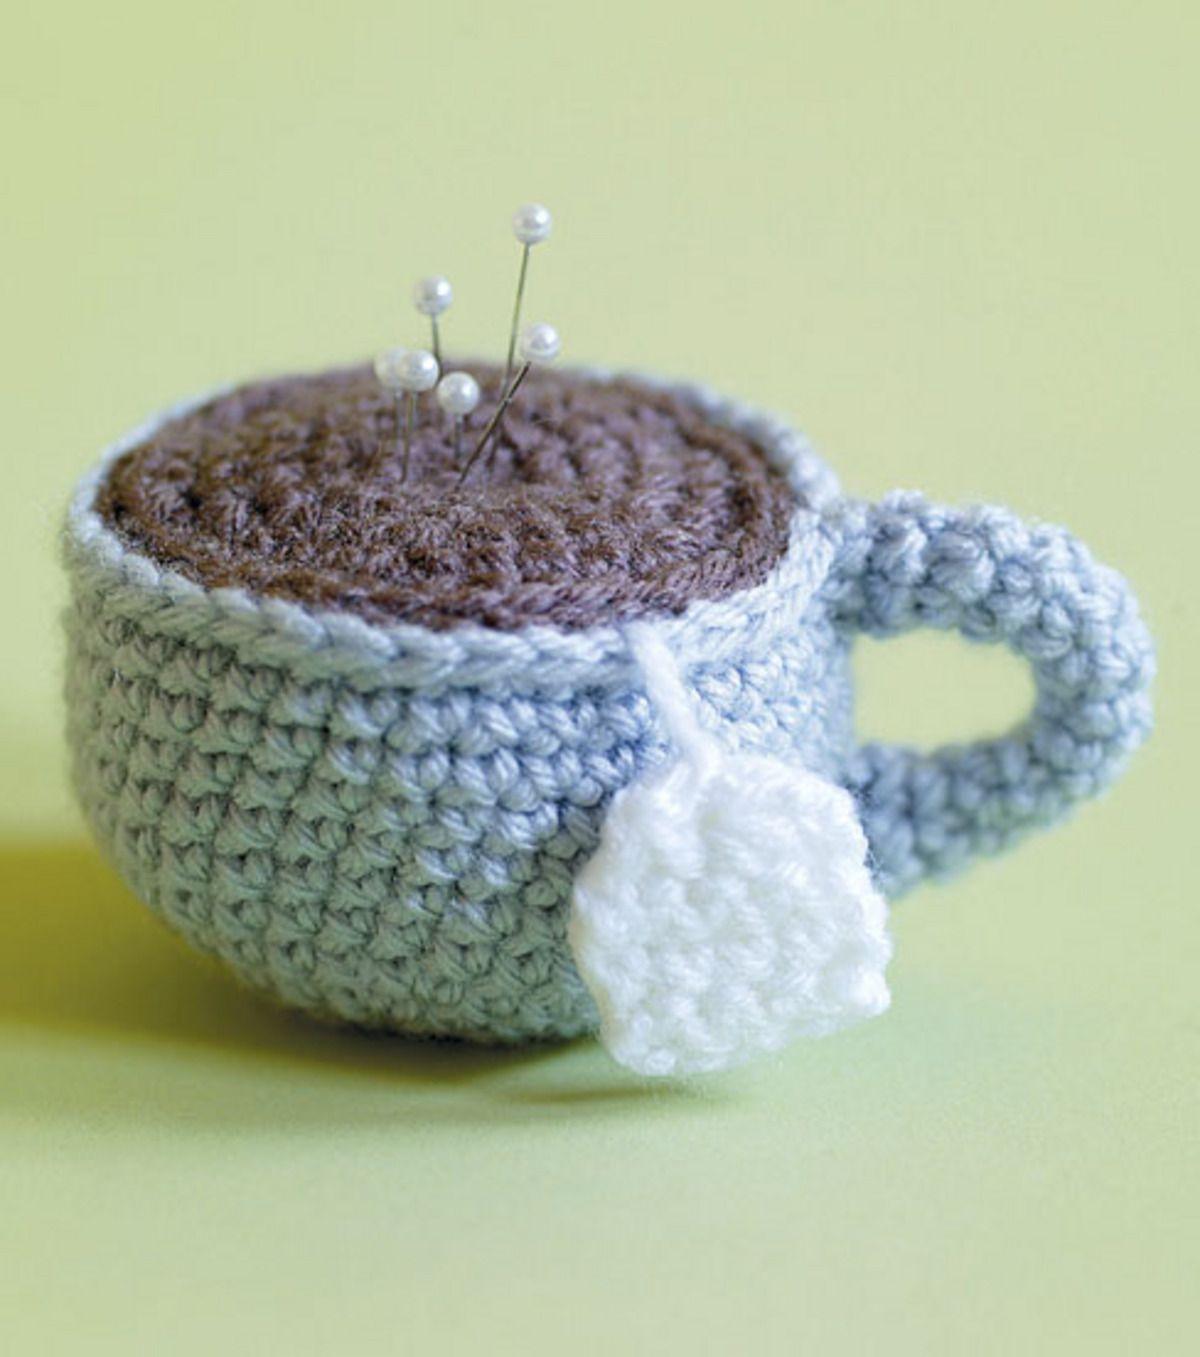 Craftdrawer Crafts: Crochet Tea Cup Pin Cushion Pattern - Freet Pin Cushionteapocup Crochet Pattern